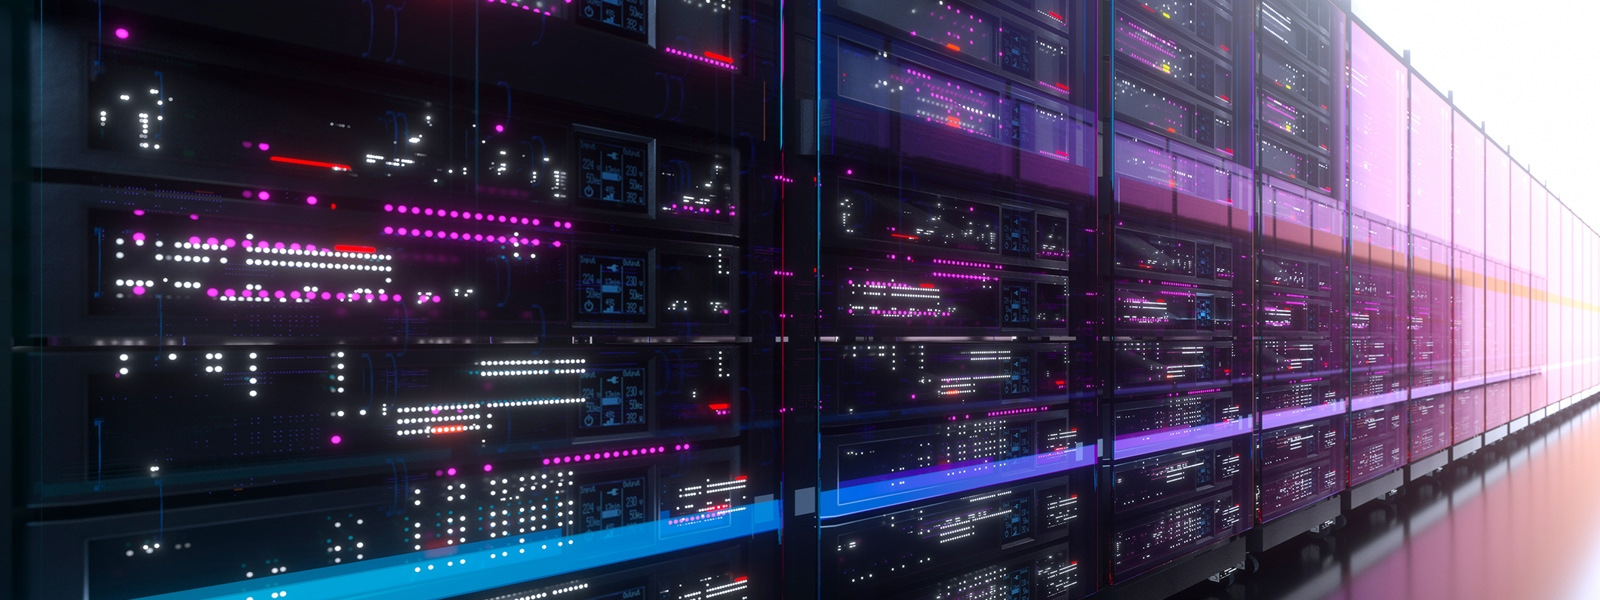 Bank of computers extending into horizon